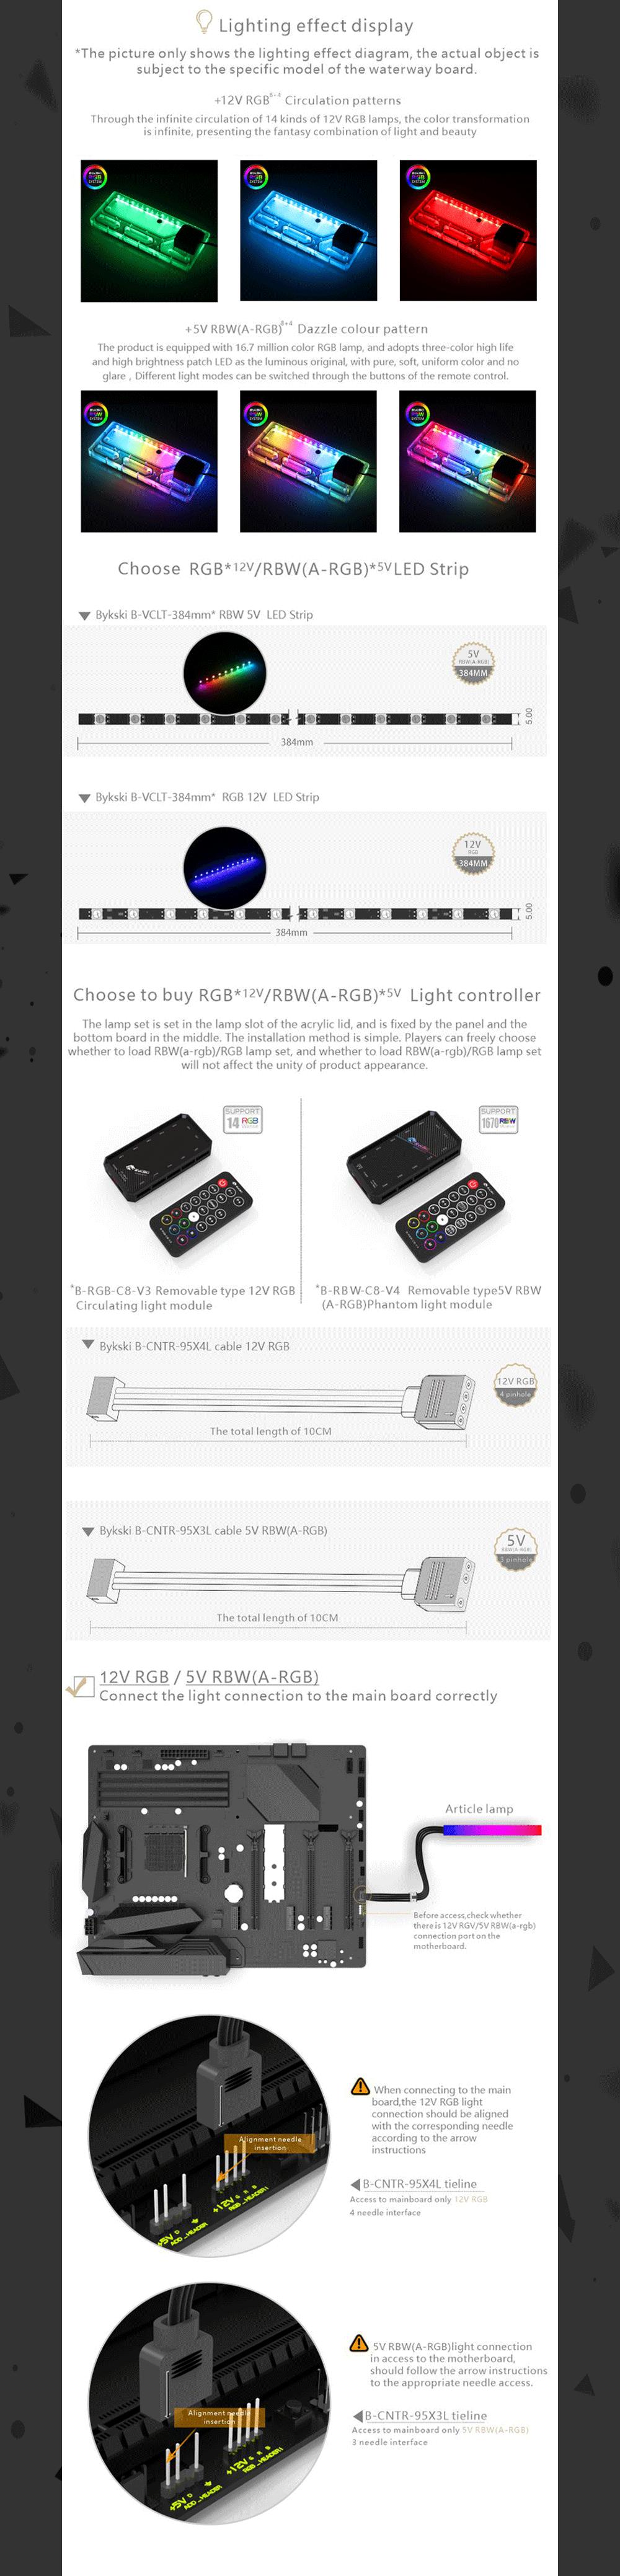 Bykski Waterway Cooling Kit For Antec P120 Case, 5V ARGB, For Single GPU Building, RGV-Antec-P120-P